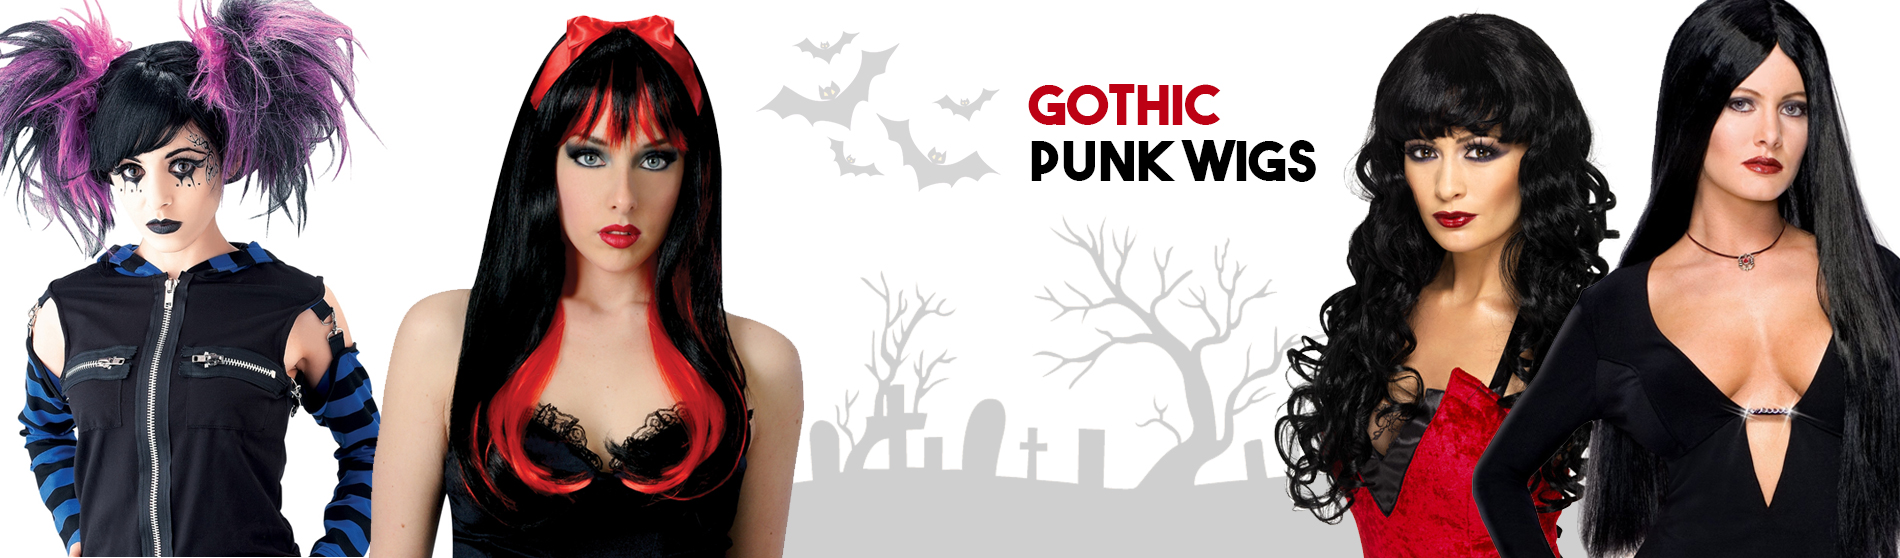 Gothic-Punk-Wigs